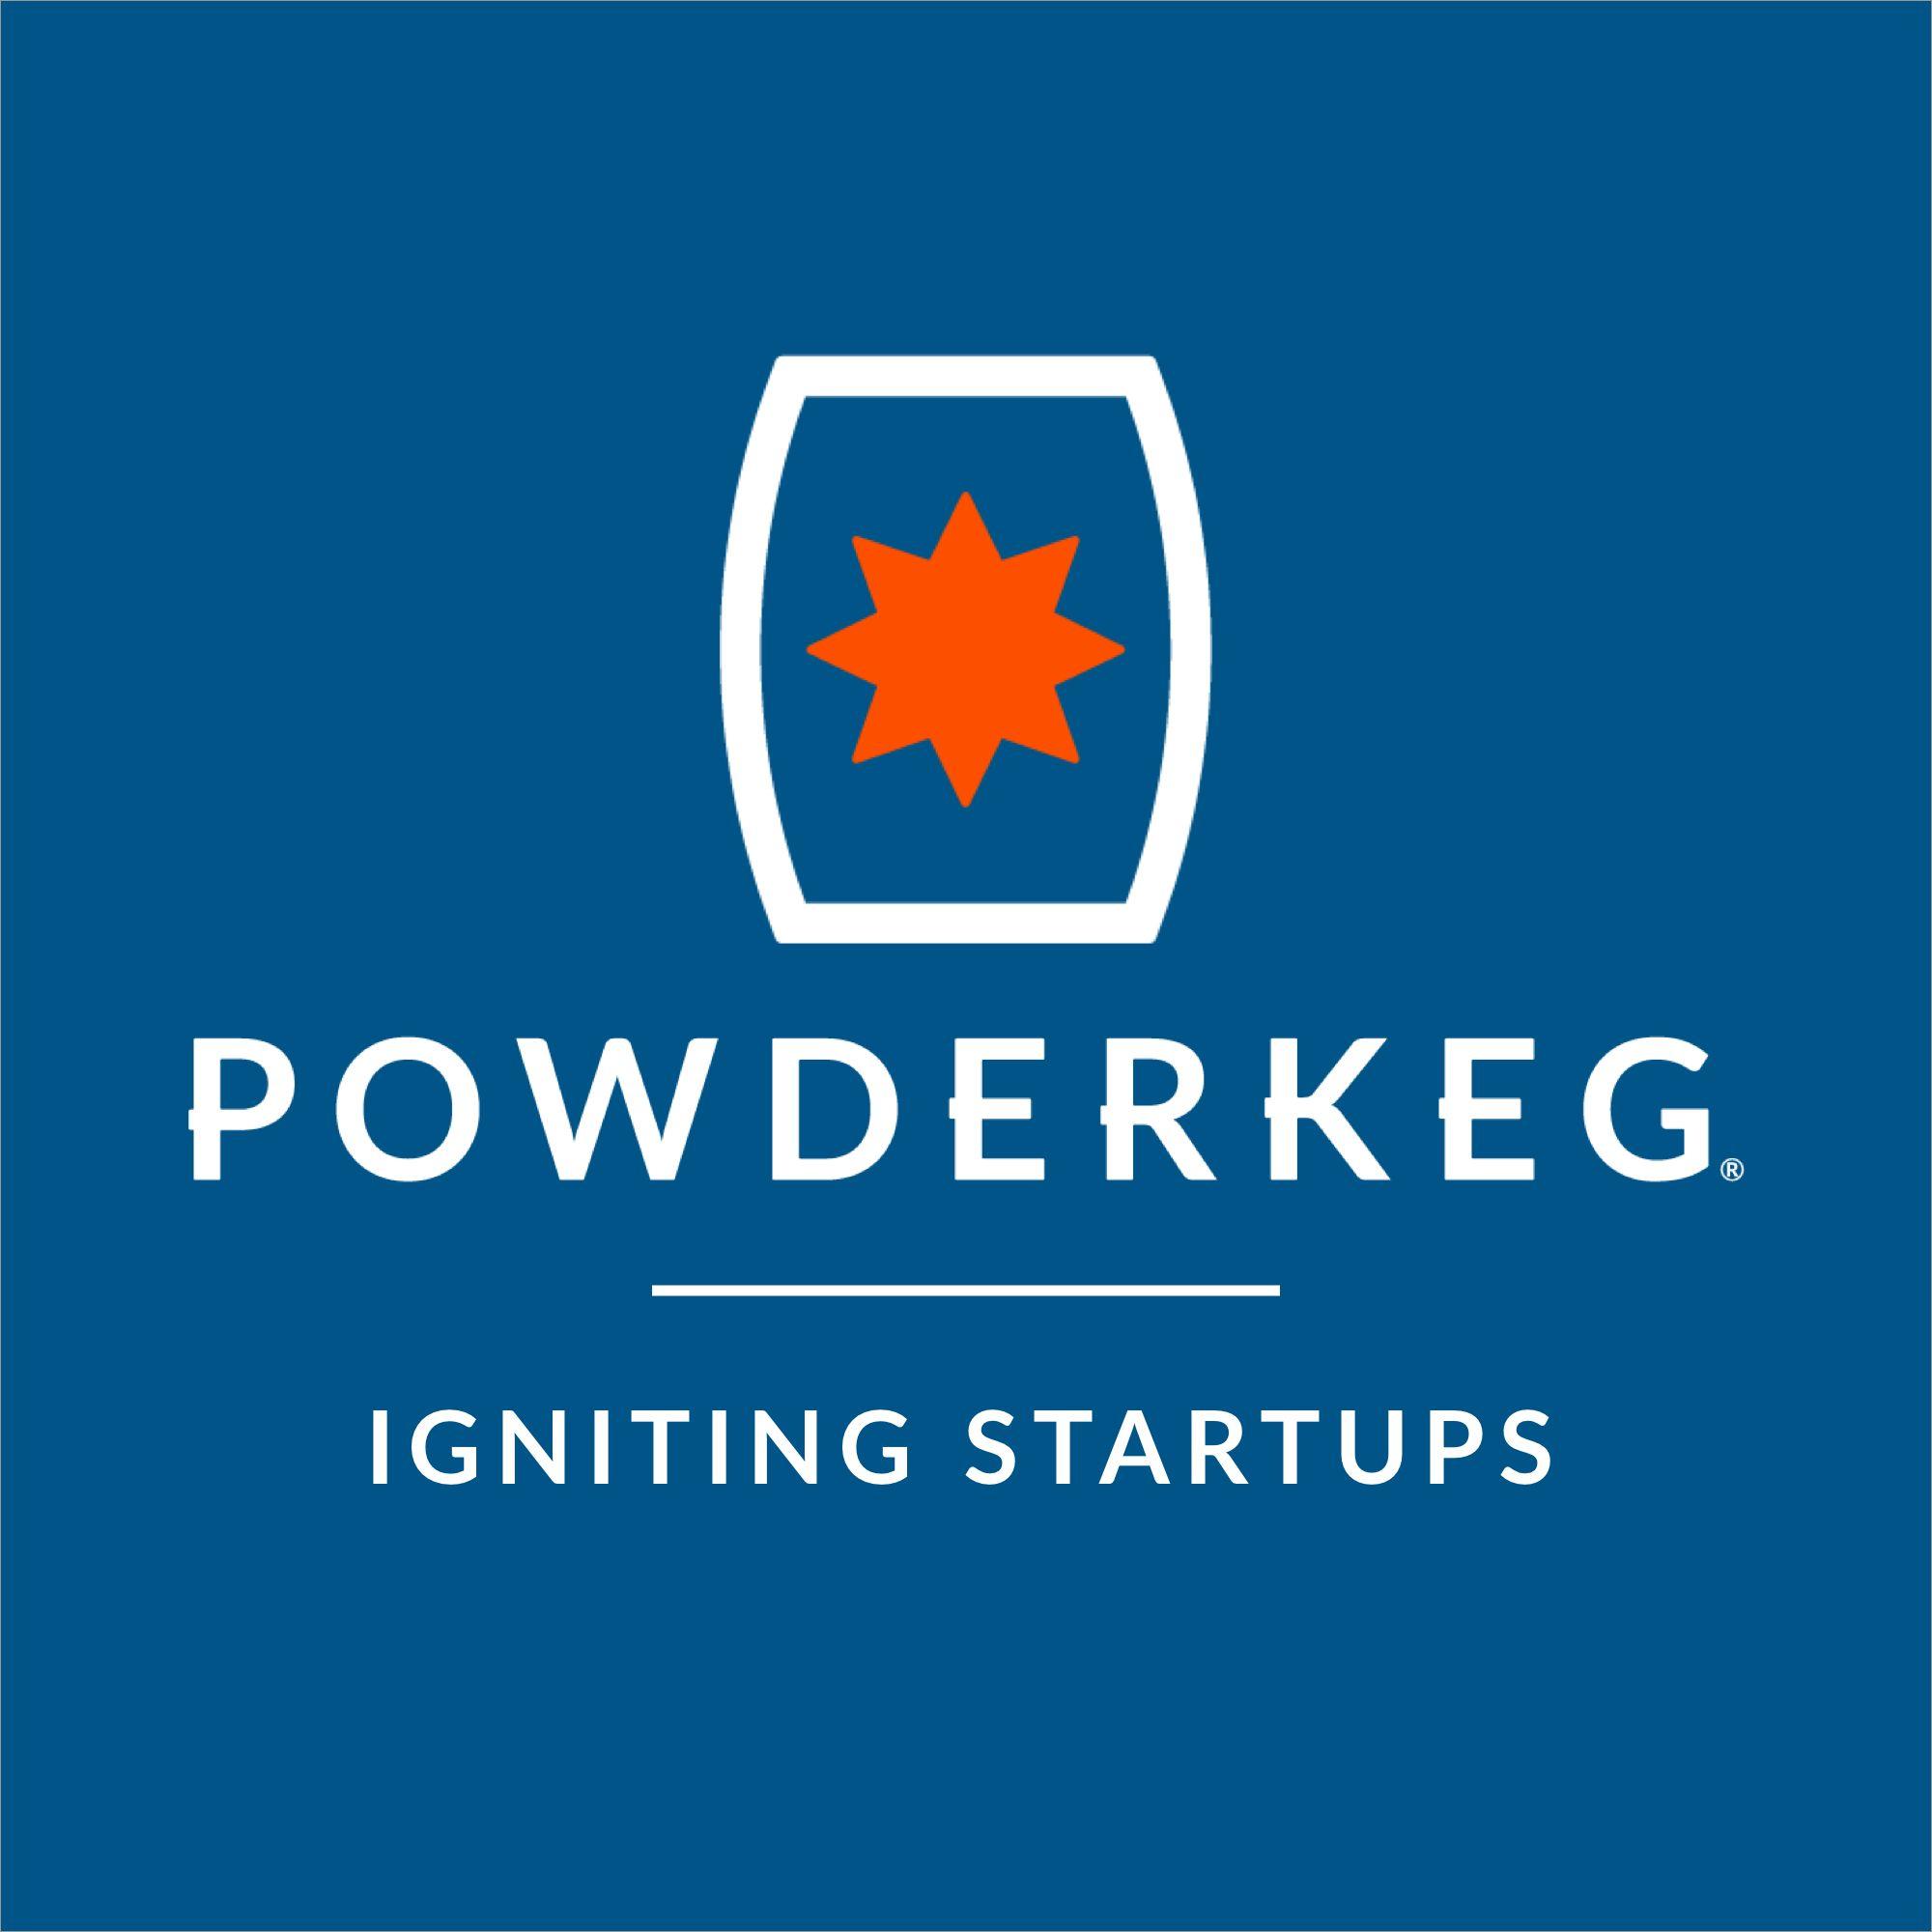 Powderkeg - Igniting Startups podcast show image